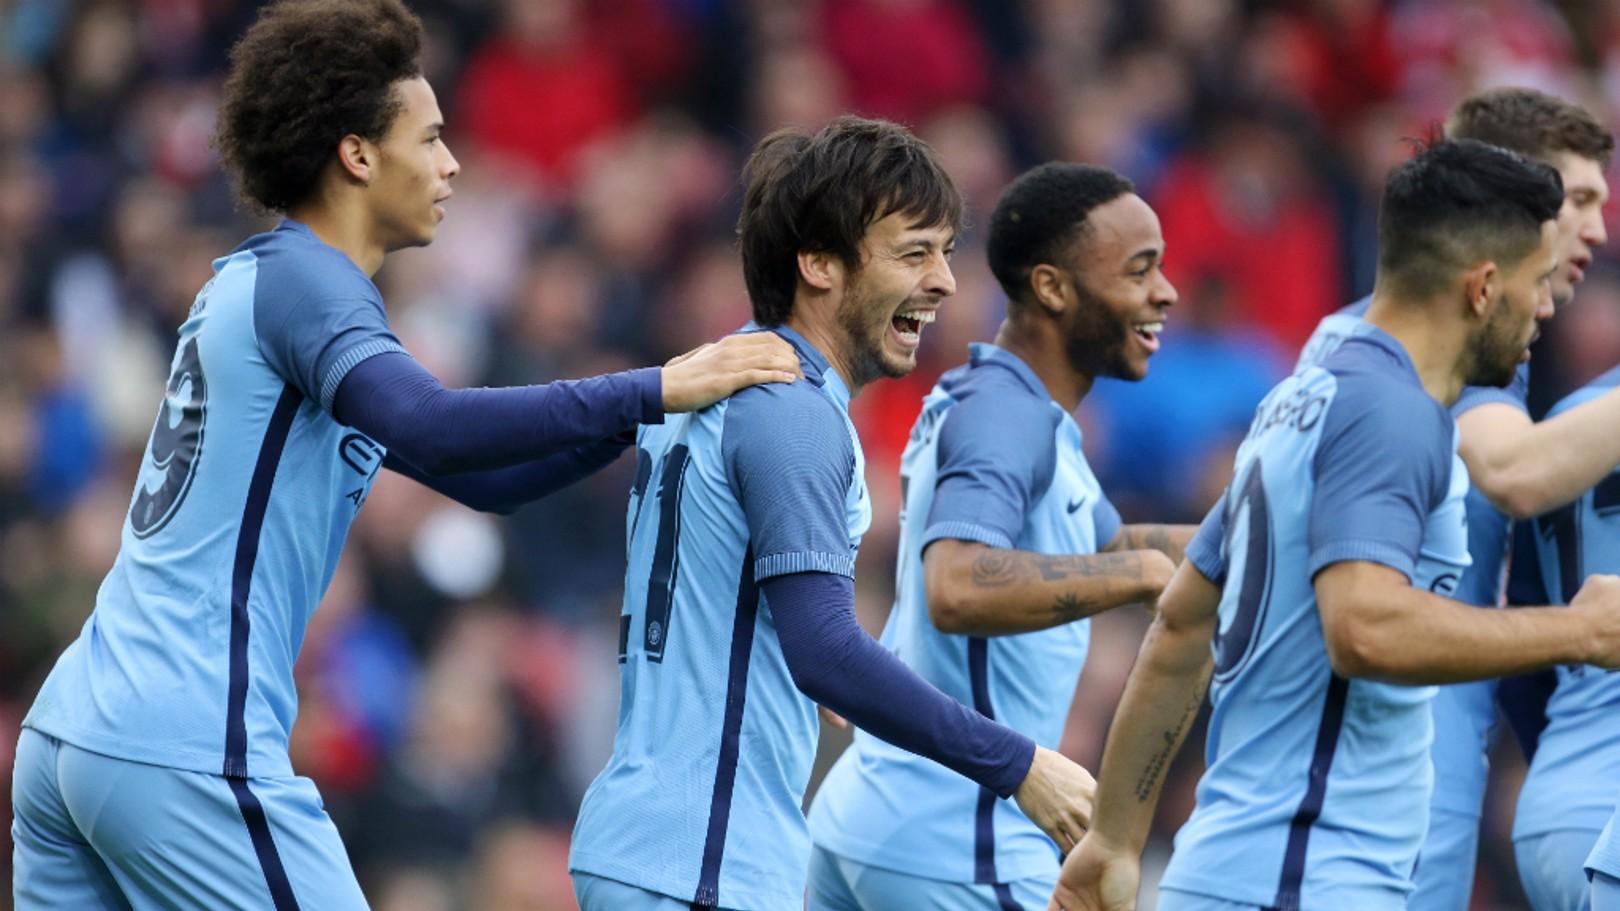 MAGIC: The City players rush over to congratulate David Silva